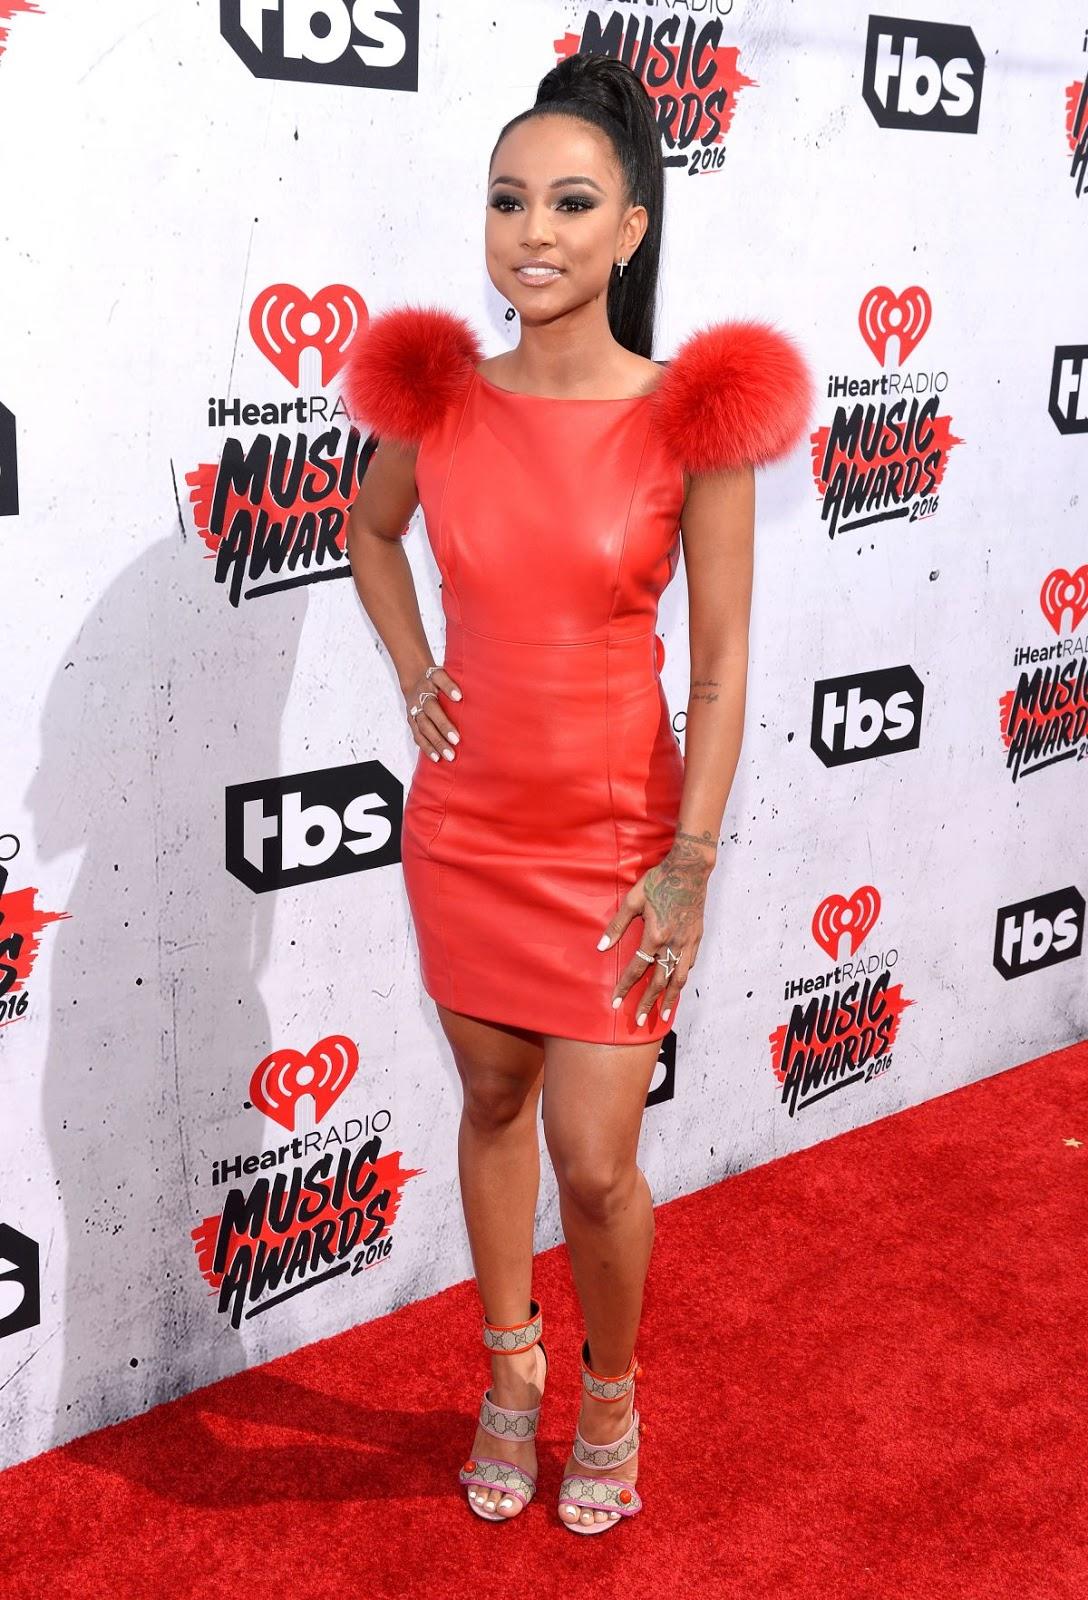 Karrueche Tran attends iHeartRadio Music Awards 2016